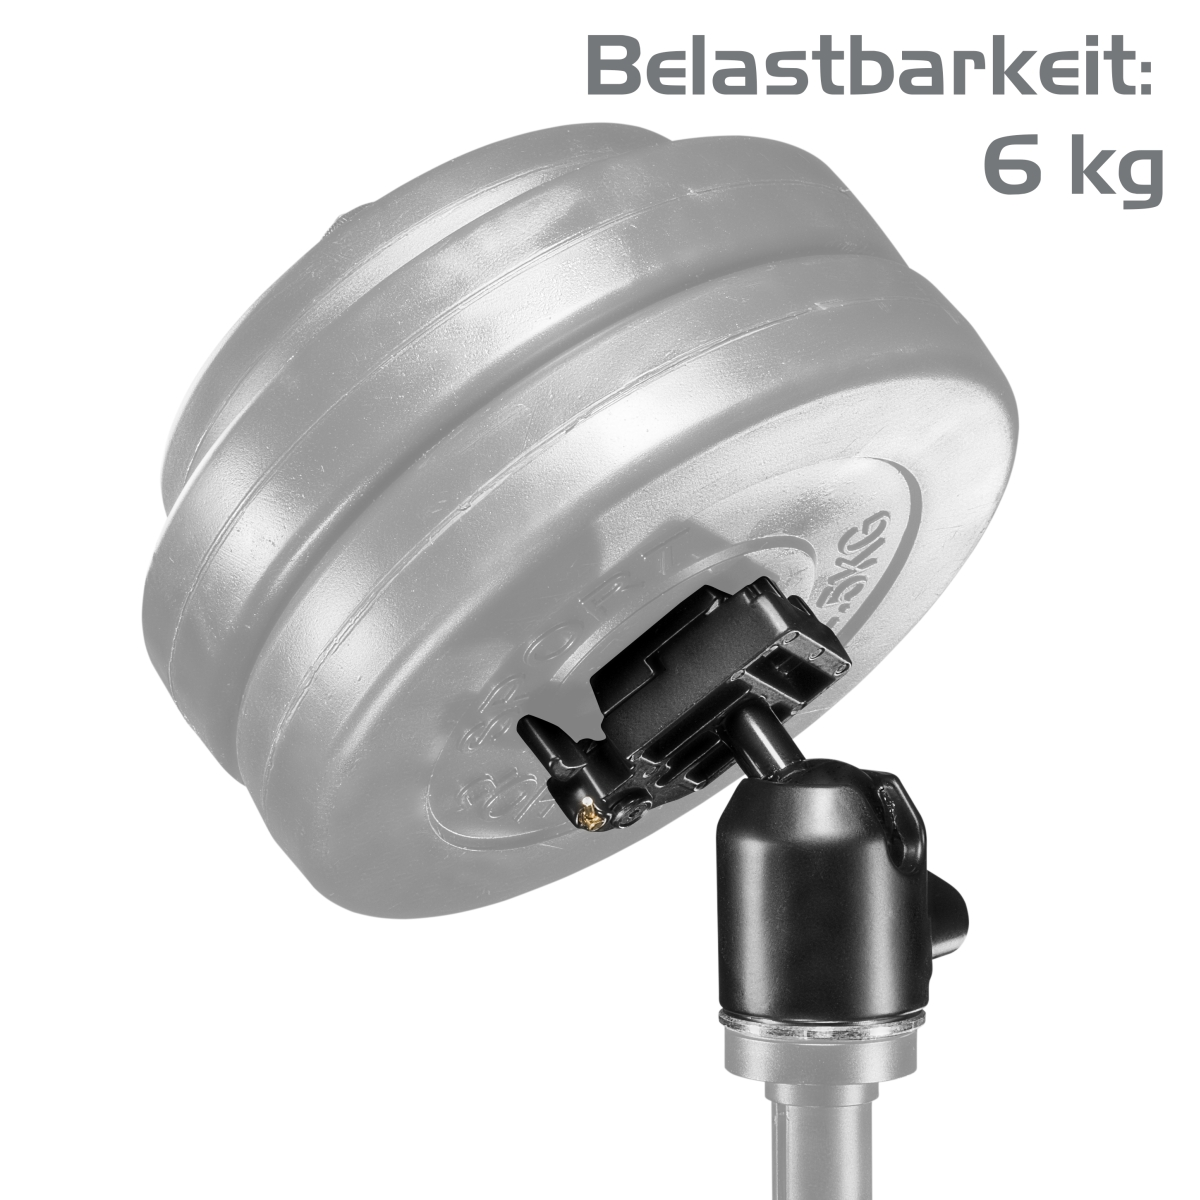 Belastbarkeit Wechselplatte max mantona Kugelkopf XL Stativkopf inkl 6 kg